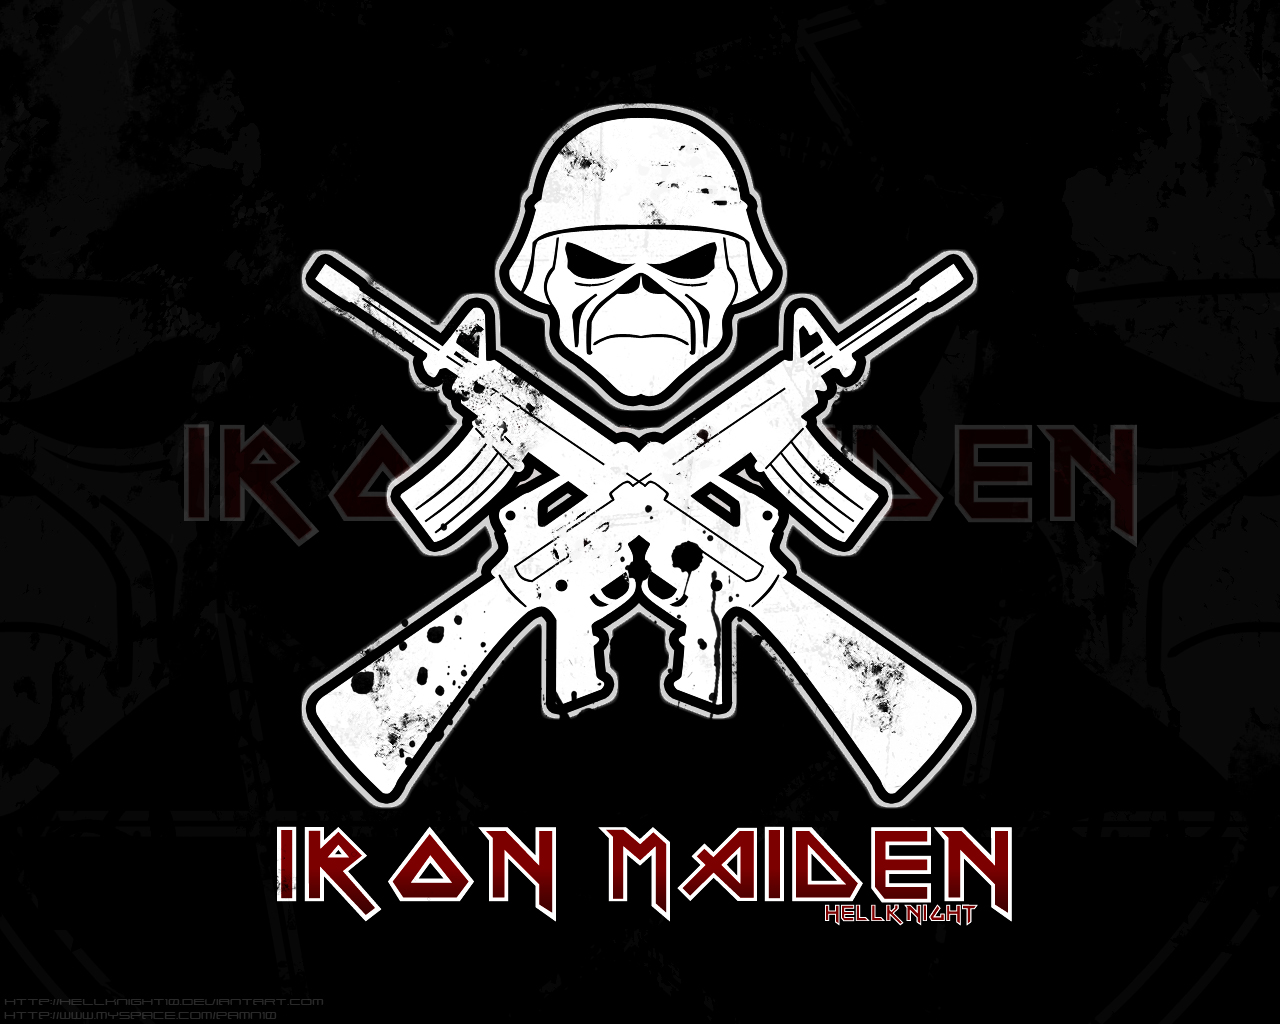 Iron Maiden en Argentina pineros web 1280x1024